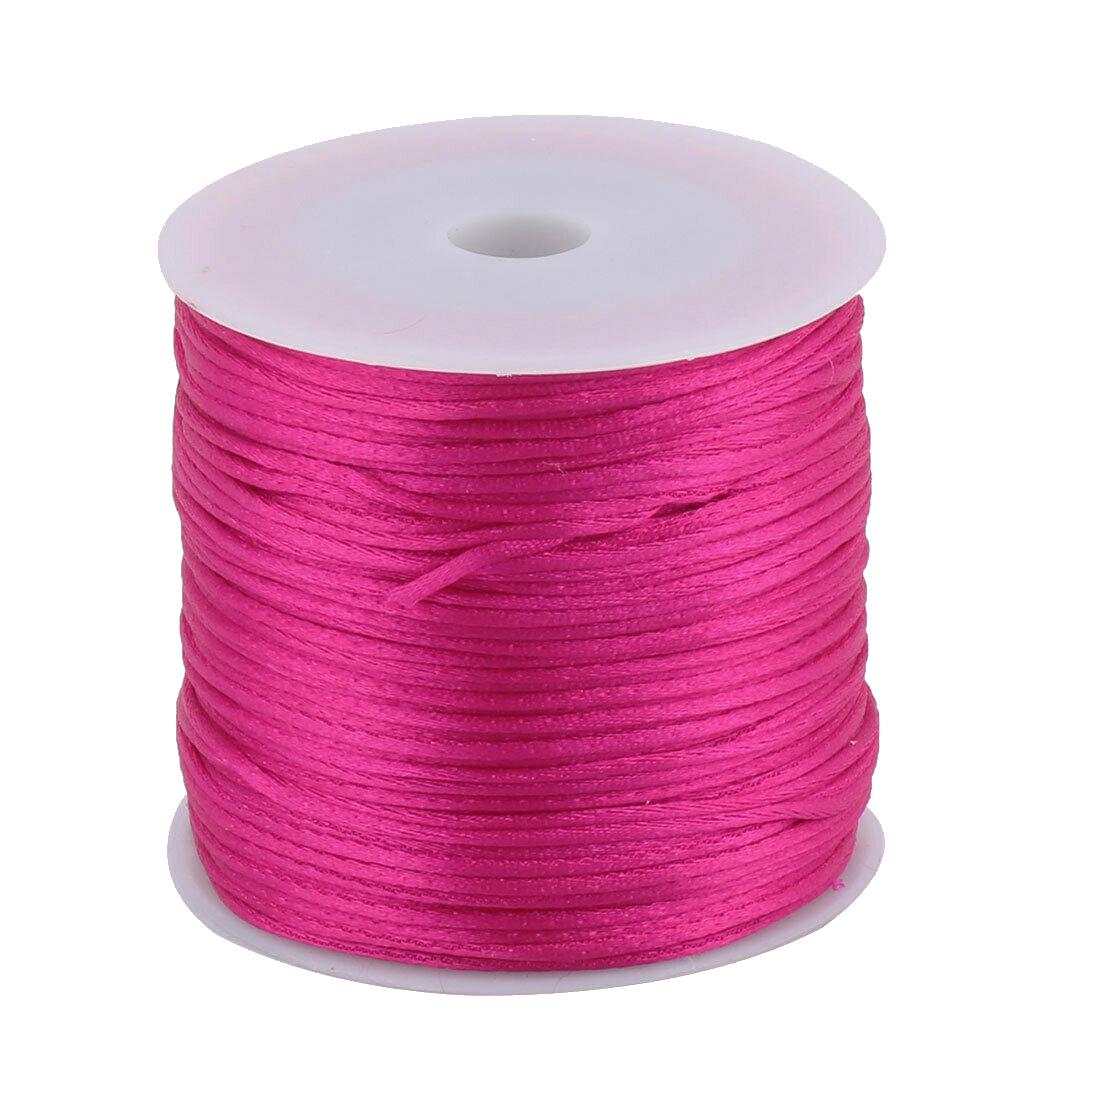 1 Mousetail 15mm Nylon Cord 76 Yards 70m Dusty Rose Sova